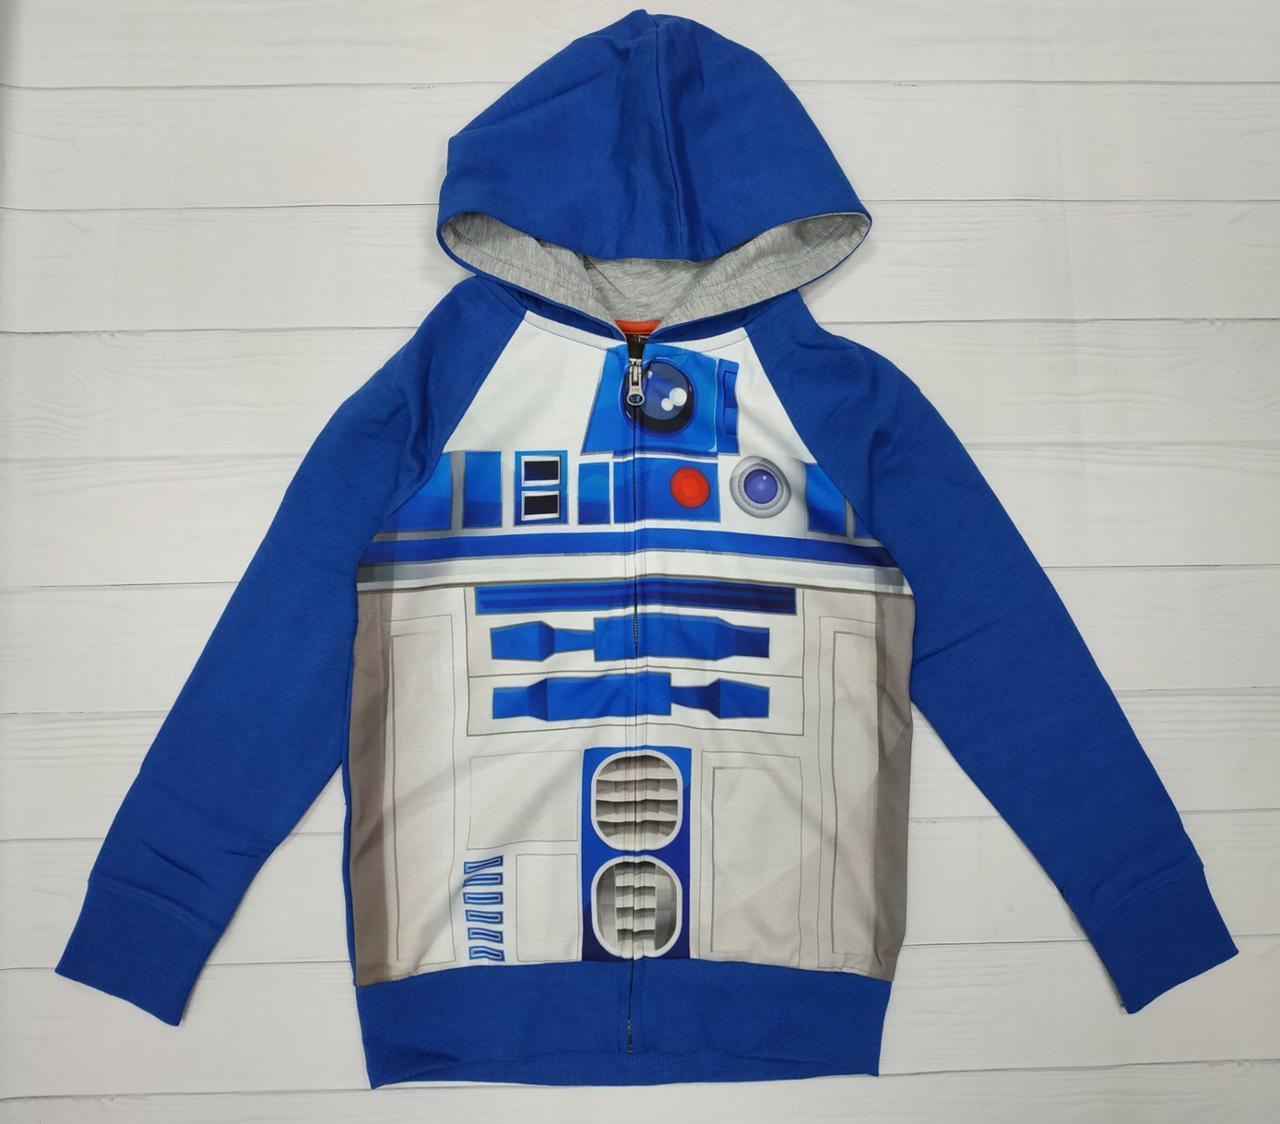 Кофта Star Wars на мальчика 8-9 лет C&A Германия Размер ...